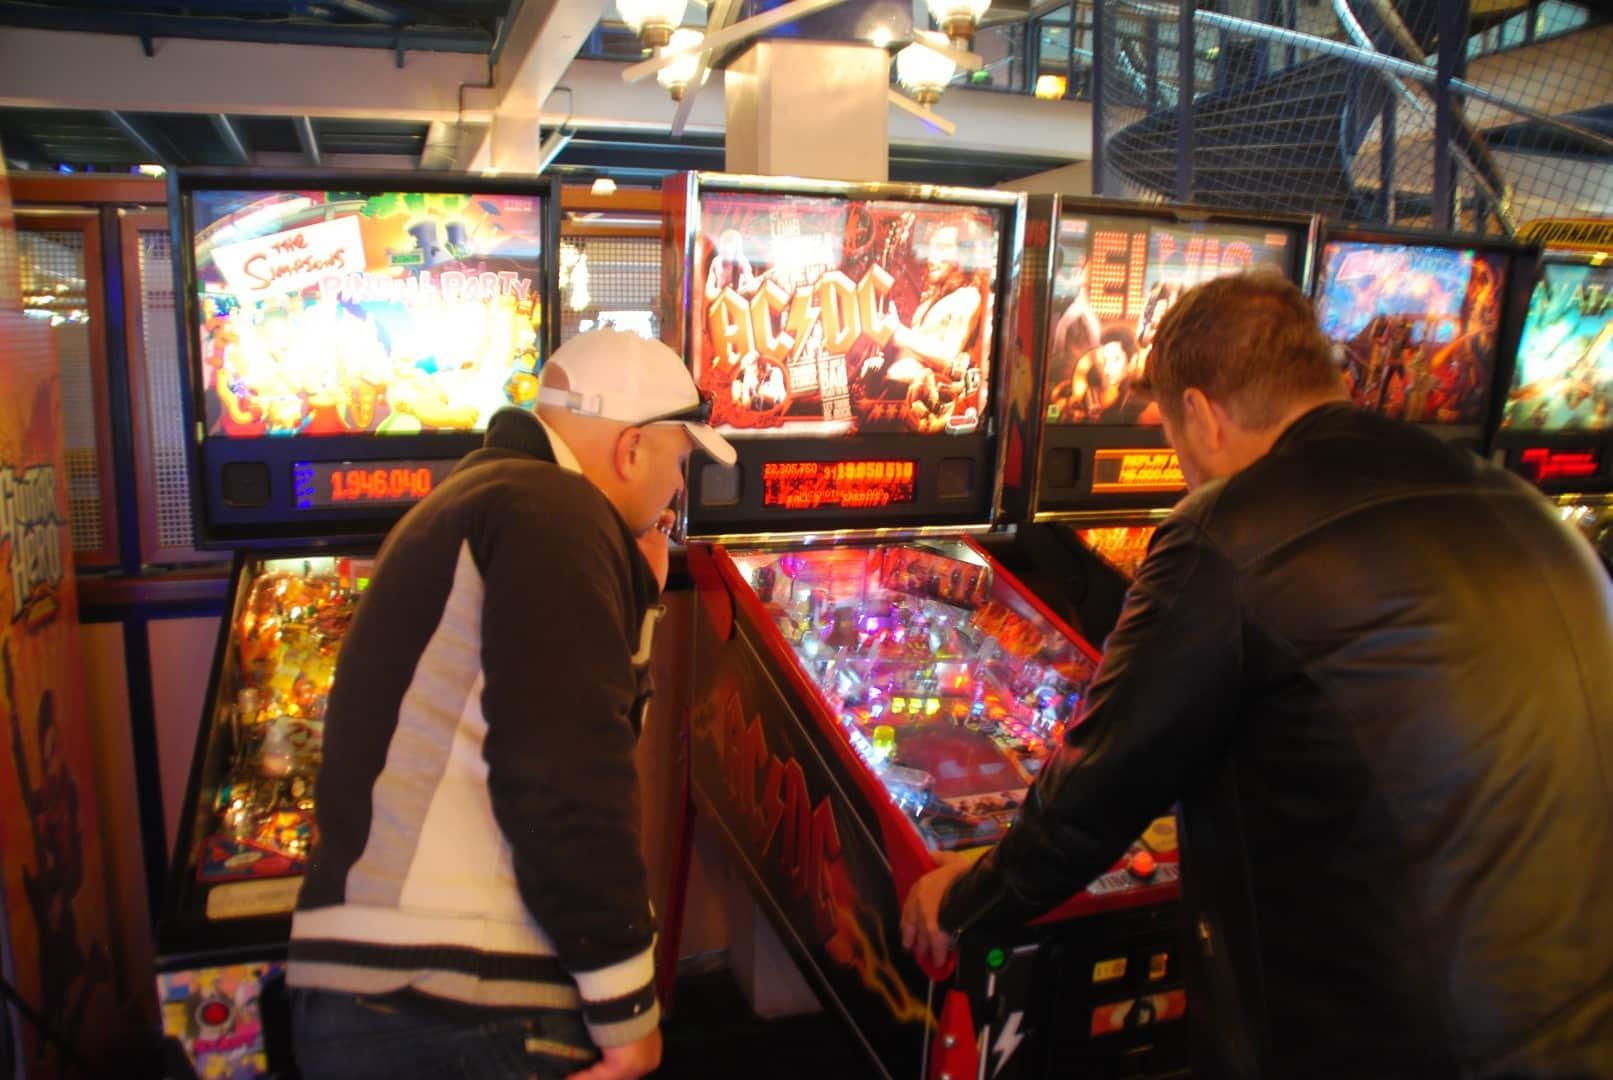 AC/DC PINBALL and The Simpsons Pinball / At Liseberg Fun Fair